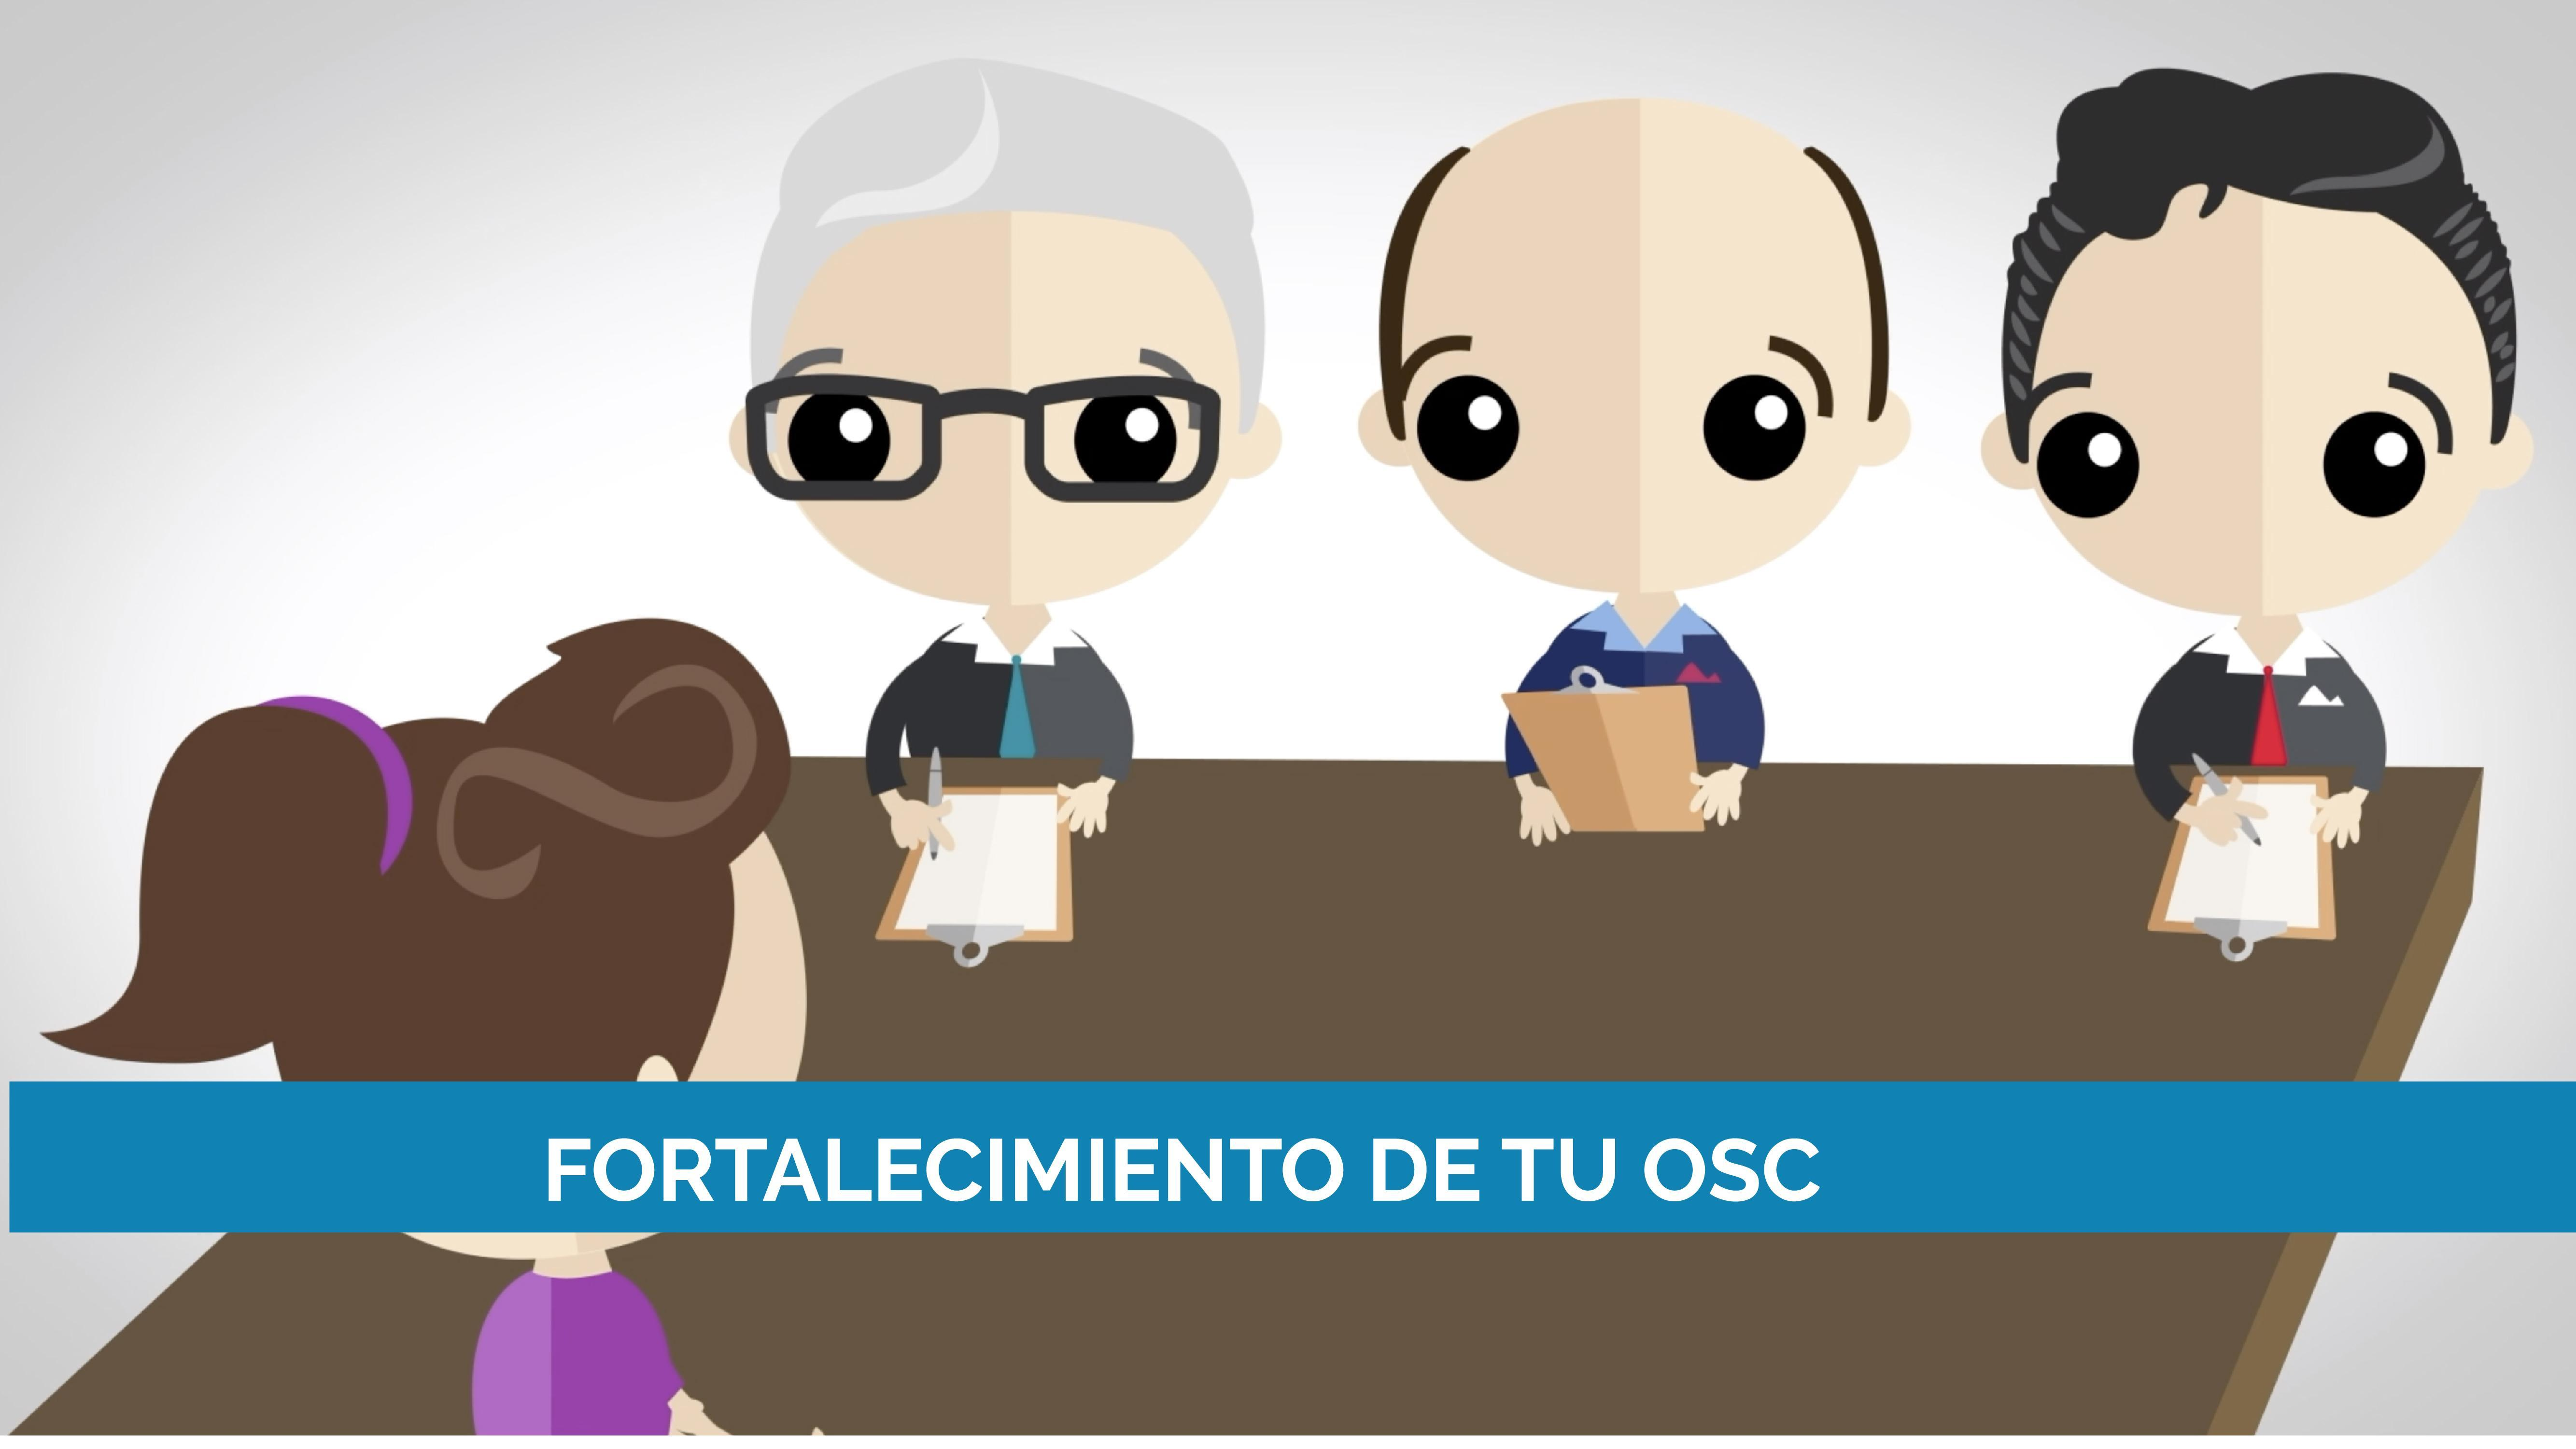 Fortalecimiento de tu OSC